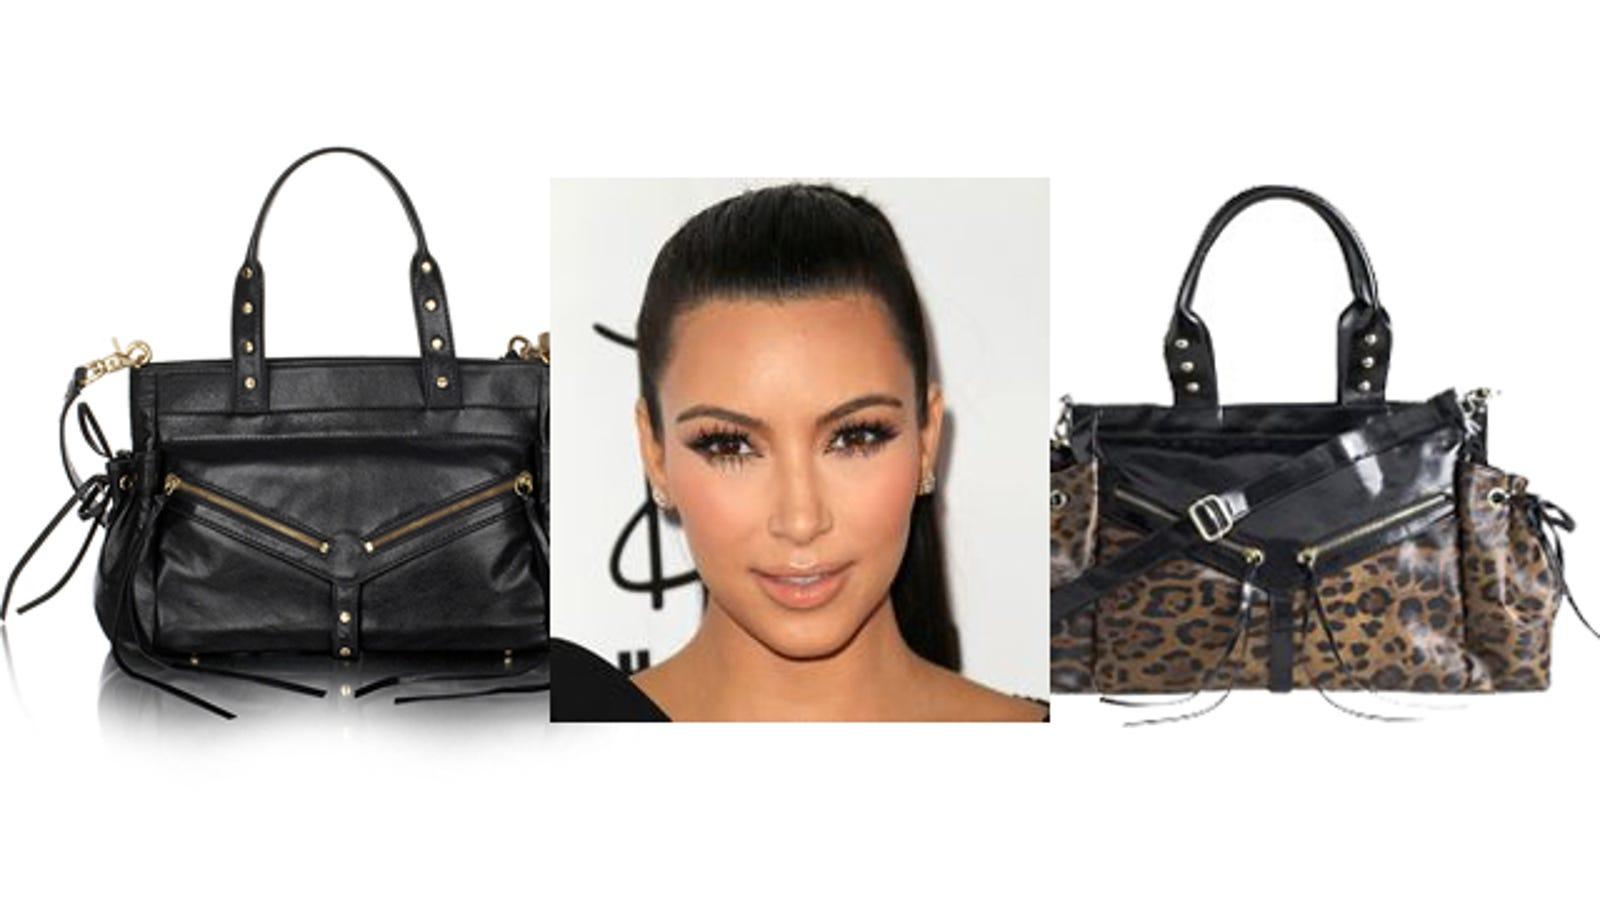 Watch - 21 with questions handbag designer monica botkier video